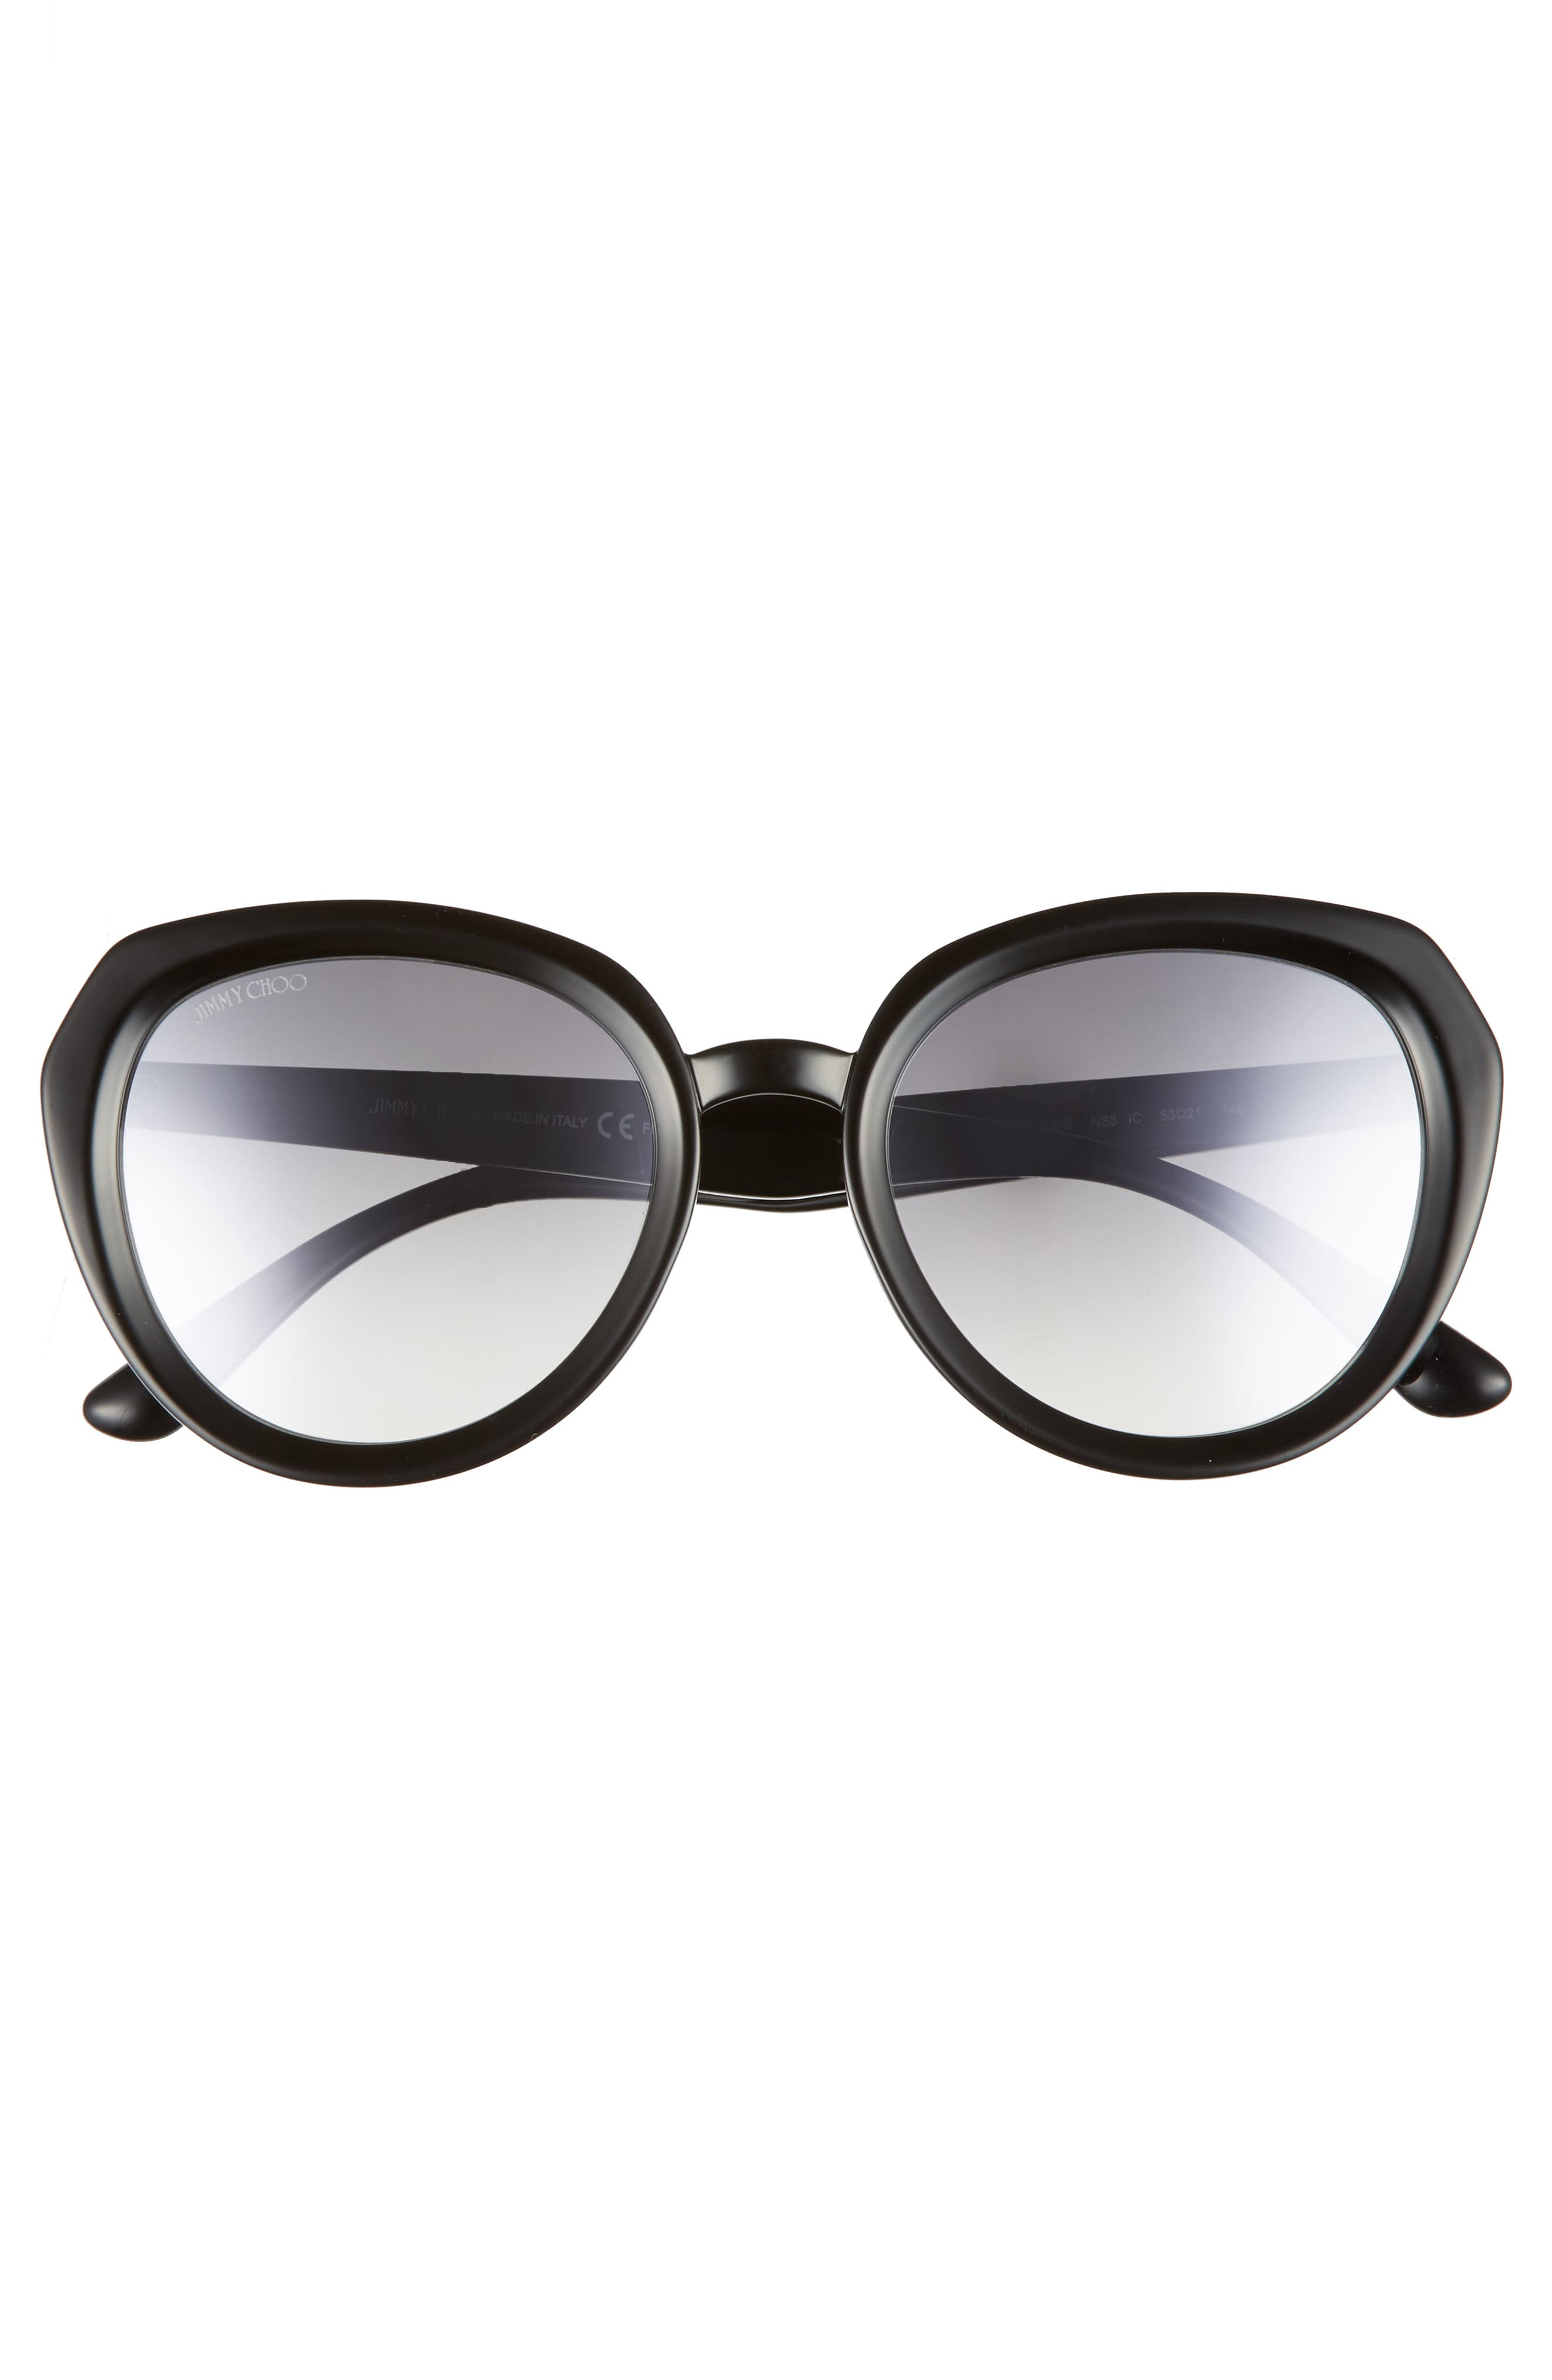 Maces 53mm Oversize Sunglasses,                             Alternate thumbnail 3, color,                             BLACK GLITTER